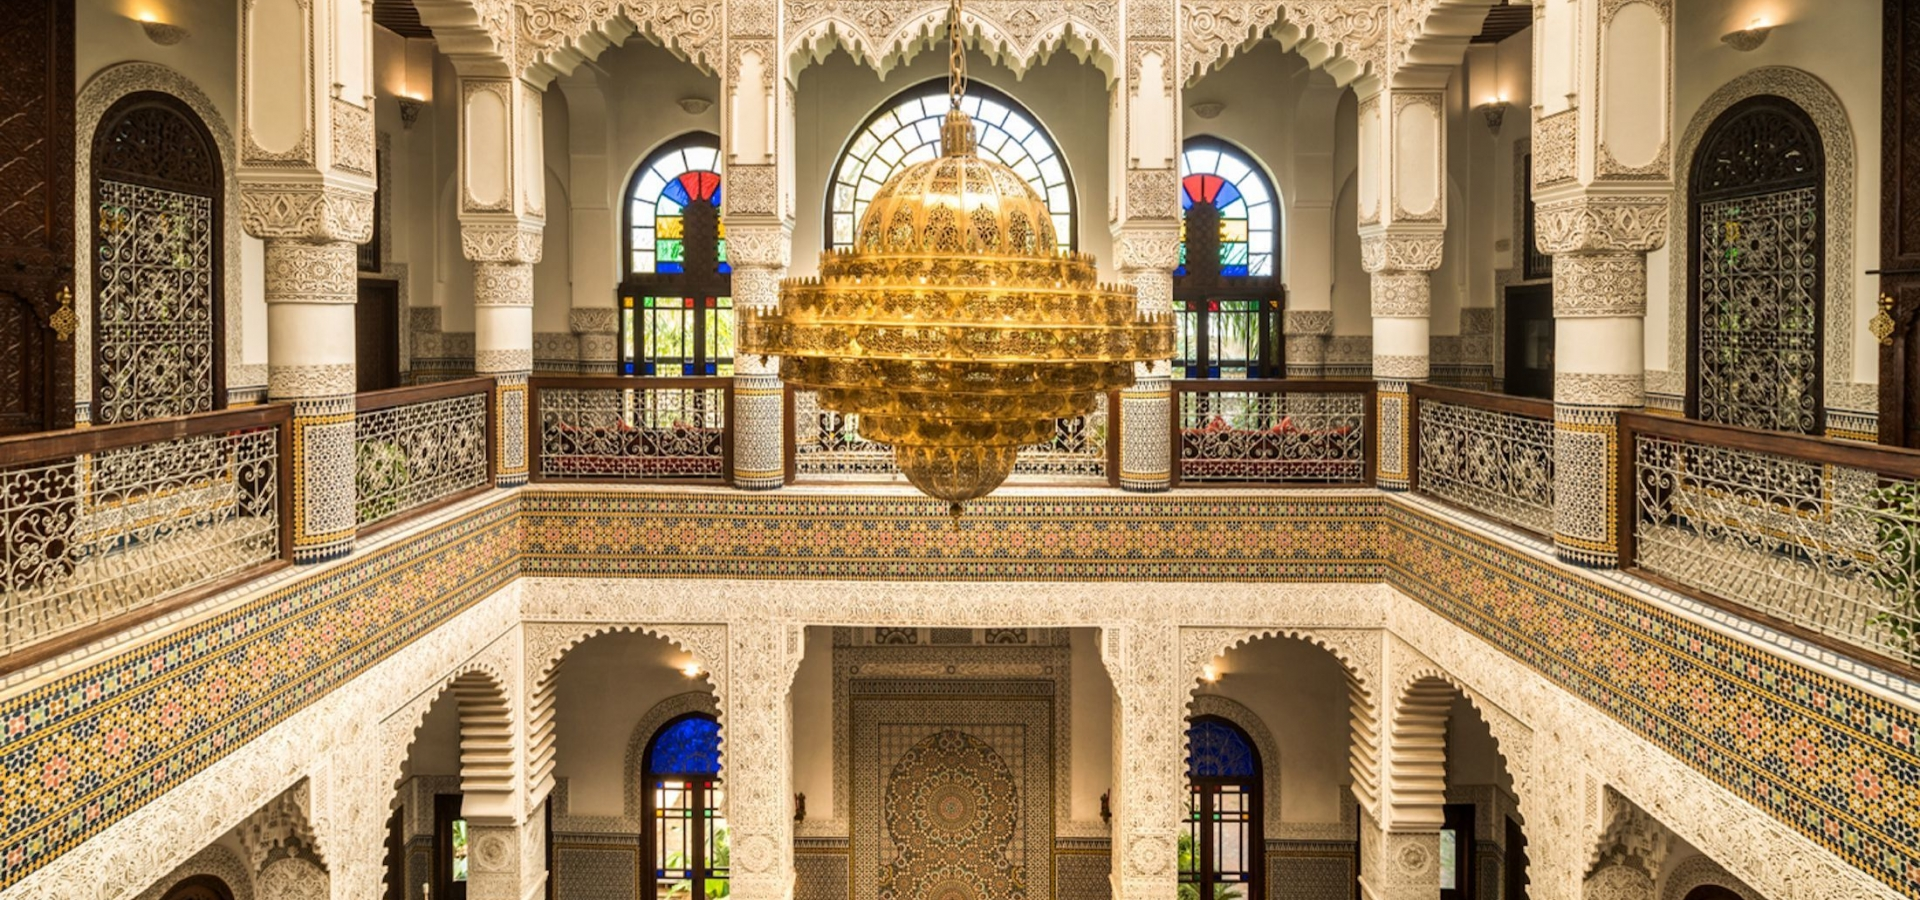 Marruecos - Riad Fes